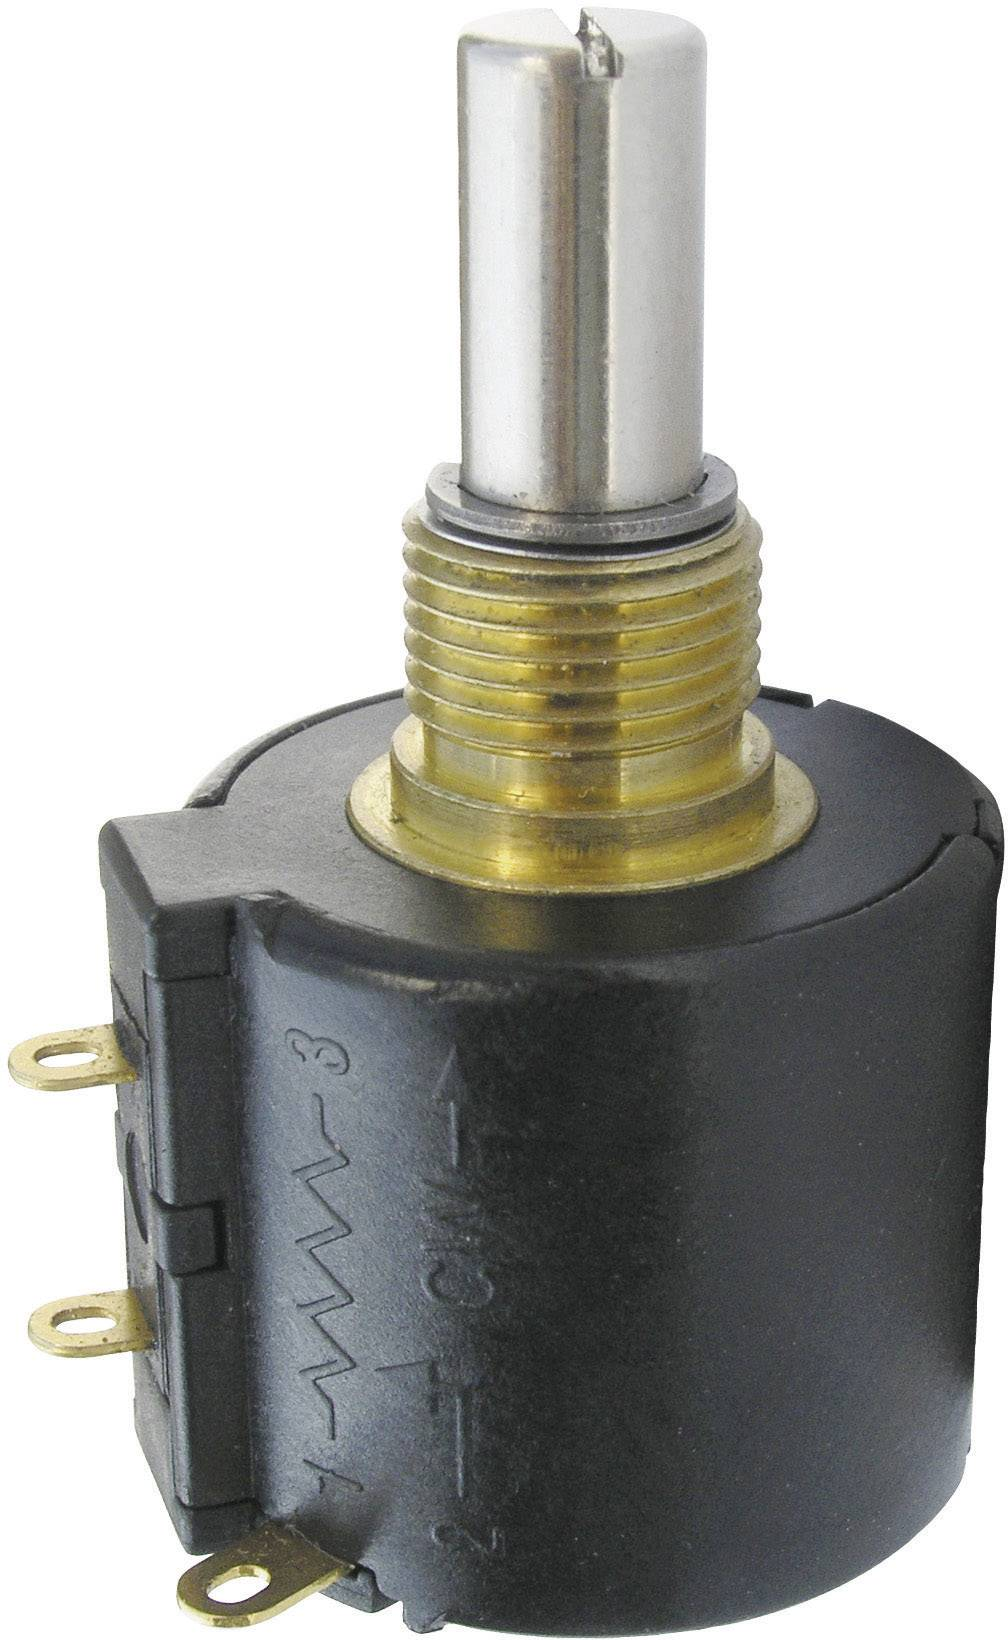 Presný potenciometer Wirewound, 10-cestný mono Bourns 3549S-1AA-102A 3549S-1AA-102A, 2 W, 1 kOhm, 1 ks